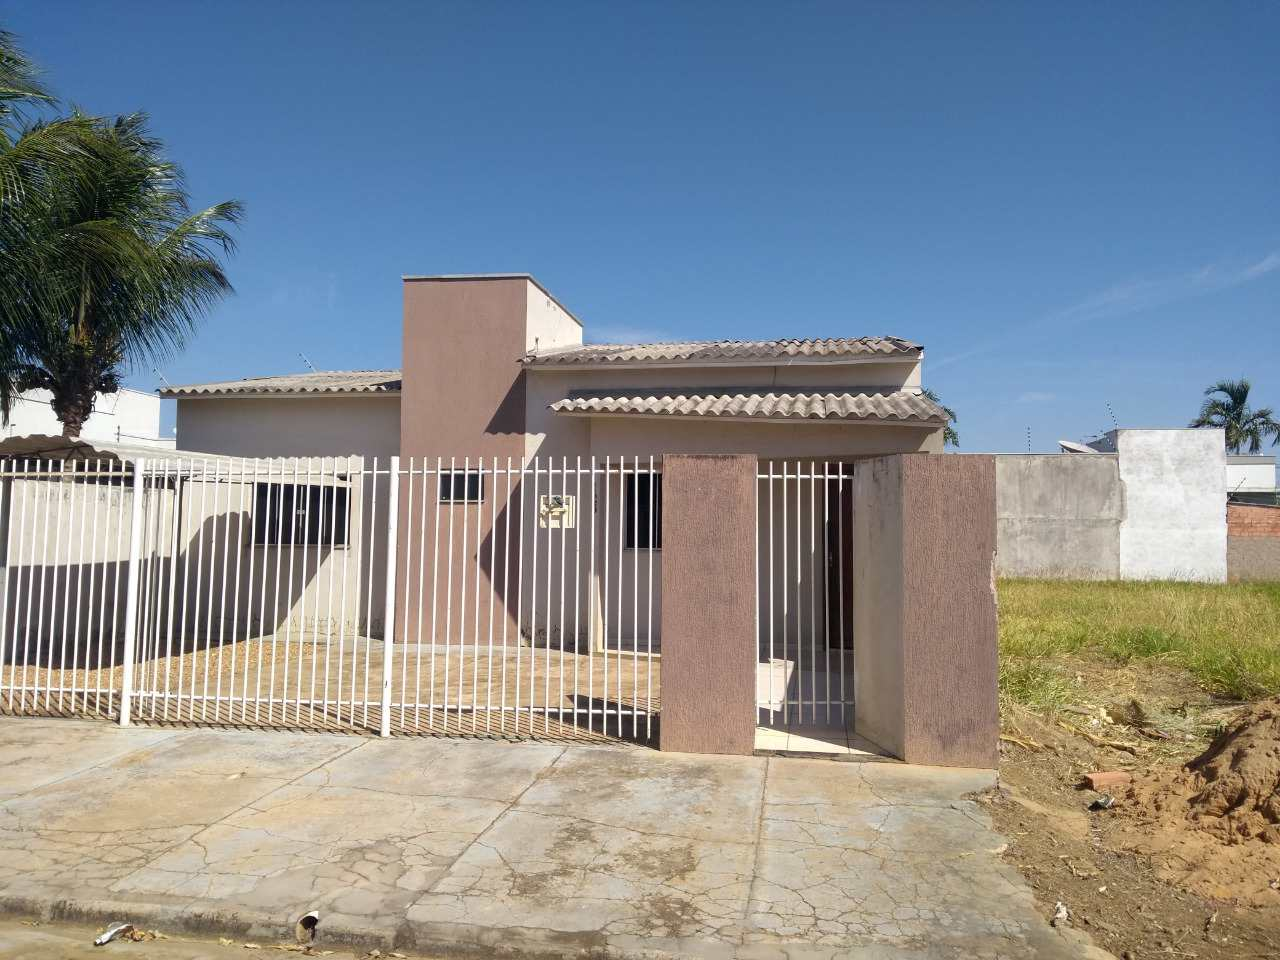 Casa com 2 dorms, Centro, Primavera do Leste - R$ 280 mil, Cod: 19